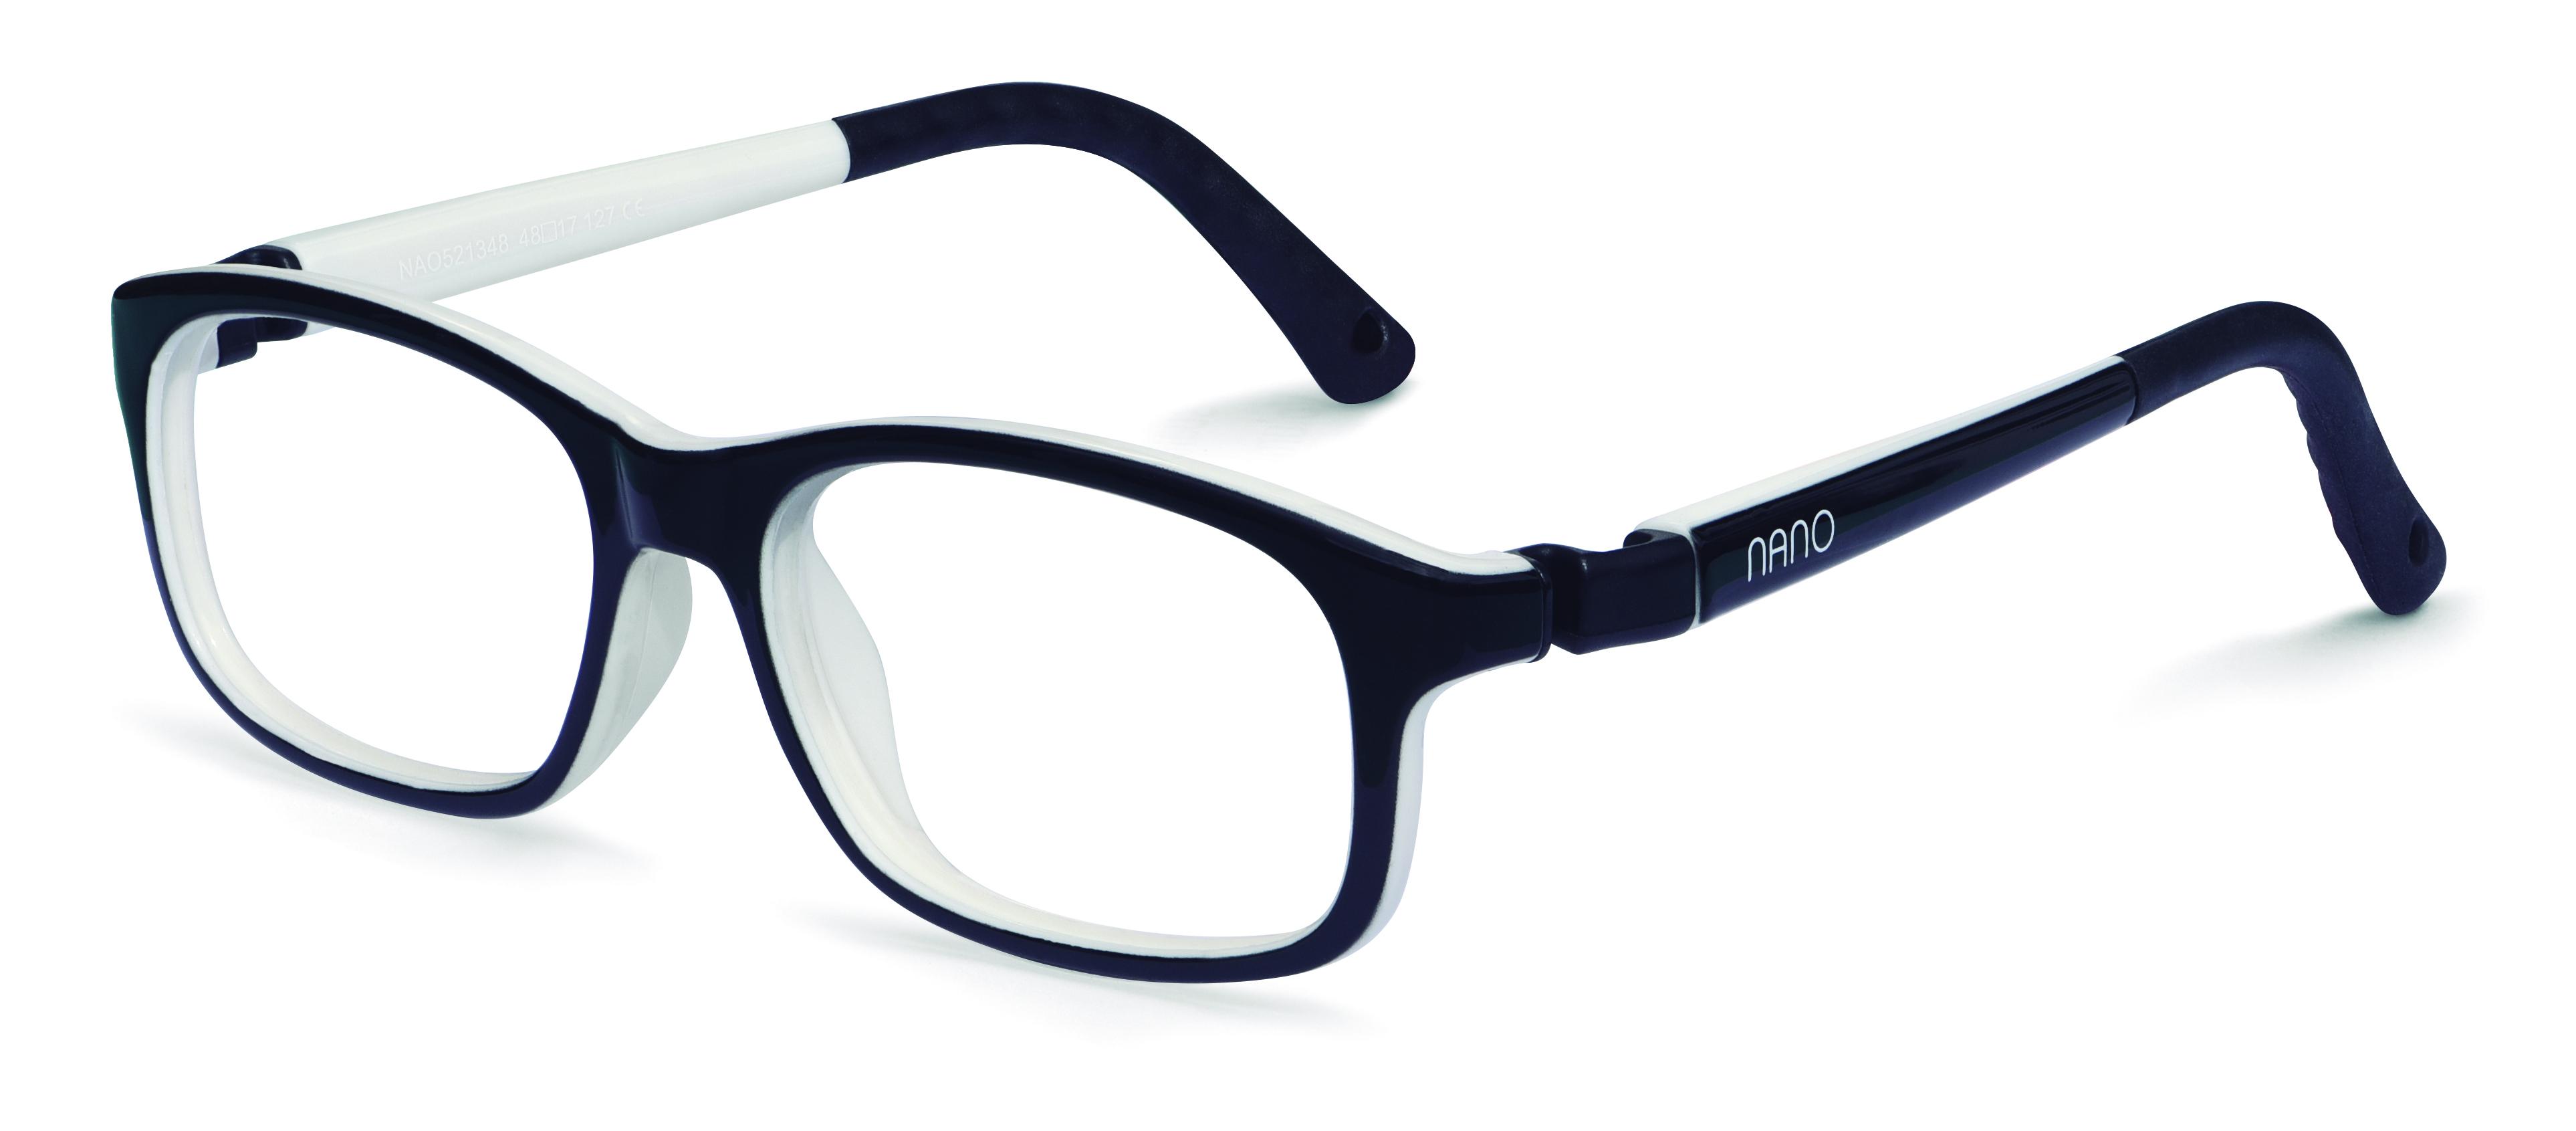 cc30b248db3 Eyewear for Kids - White 8-10 years Nano Vista - Optiwow